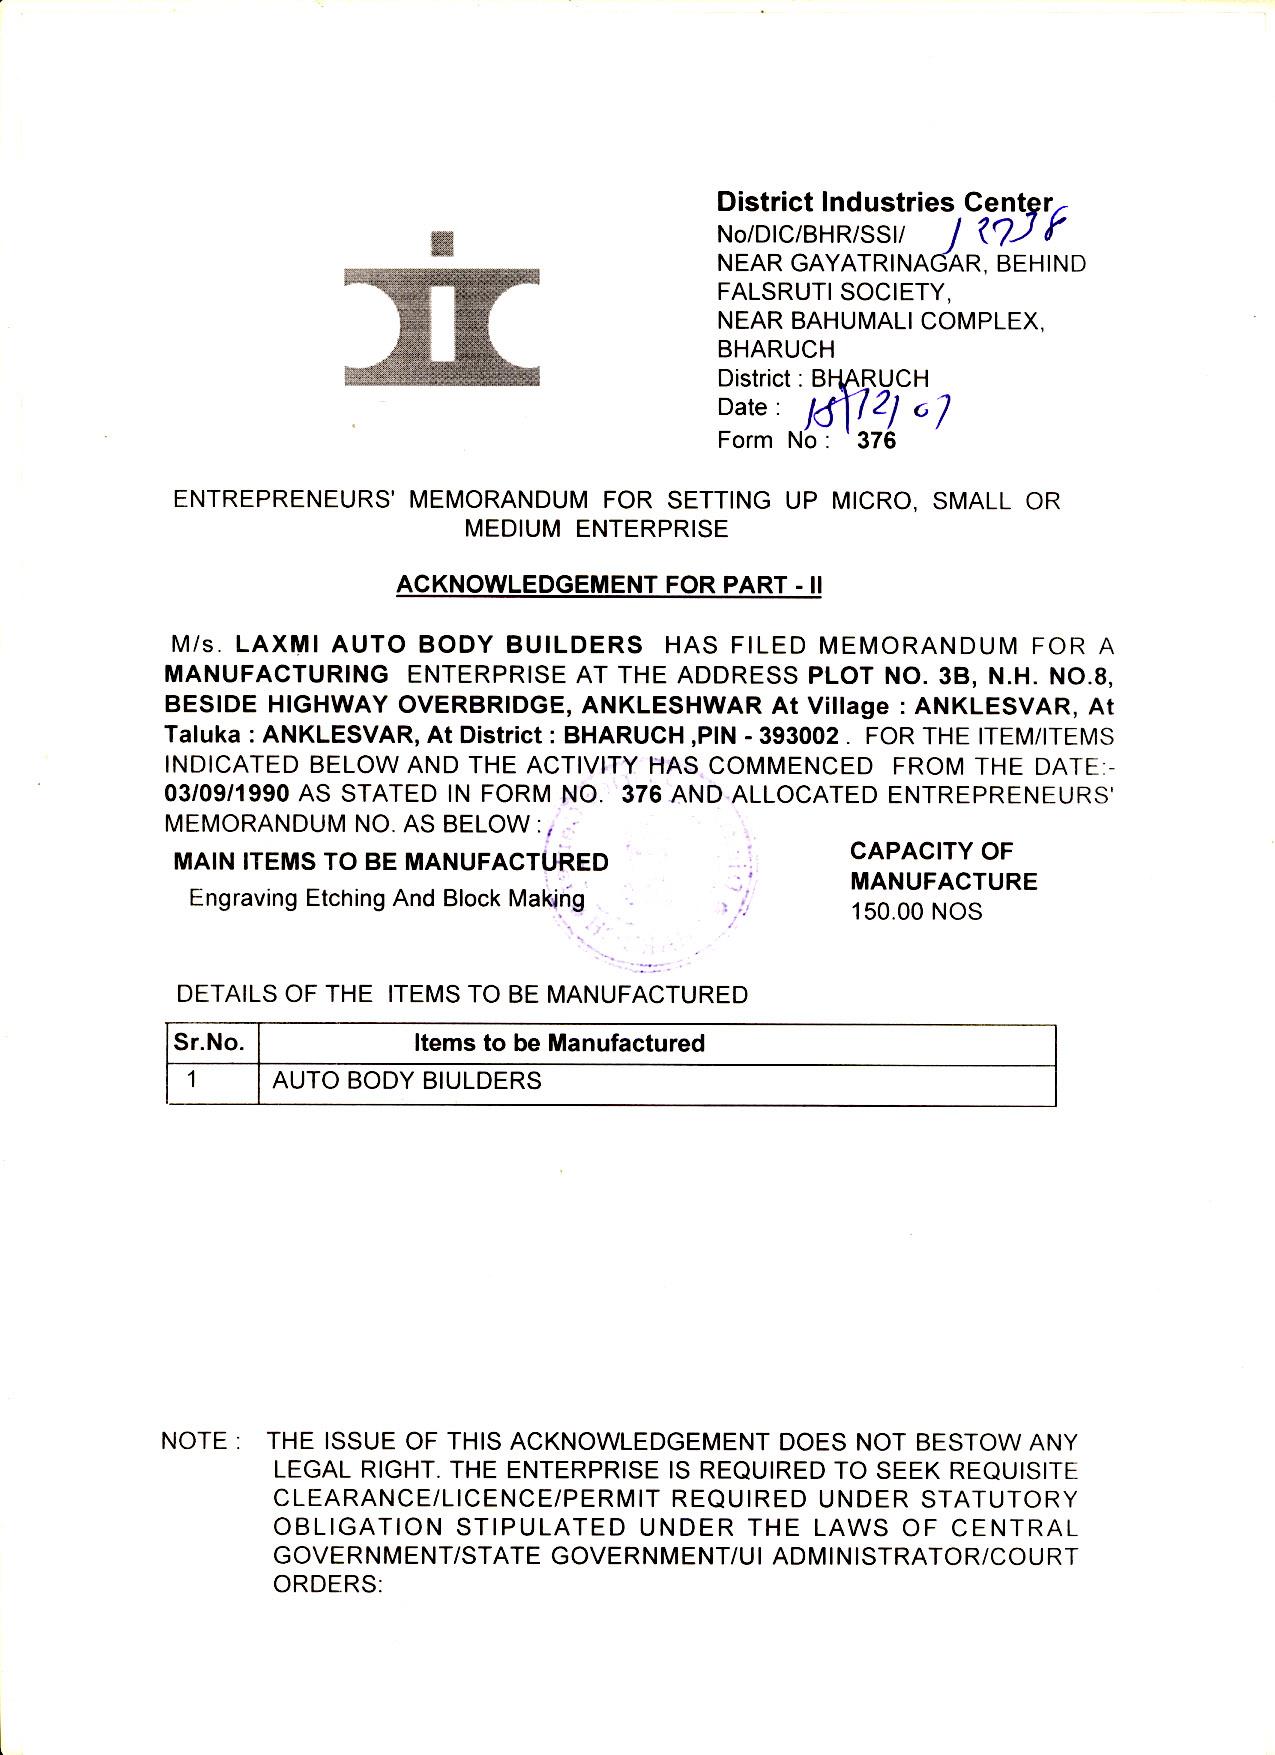 Certification laxmi auto body builders msme certificate front xflitez Images